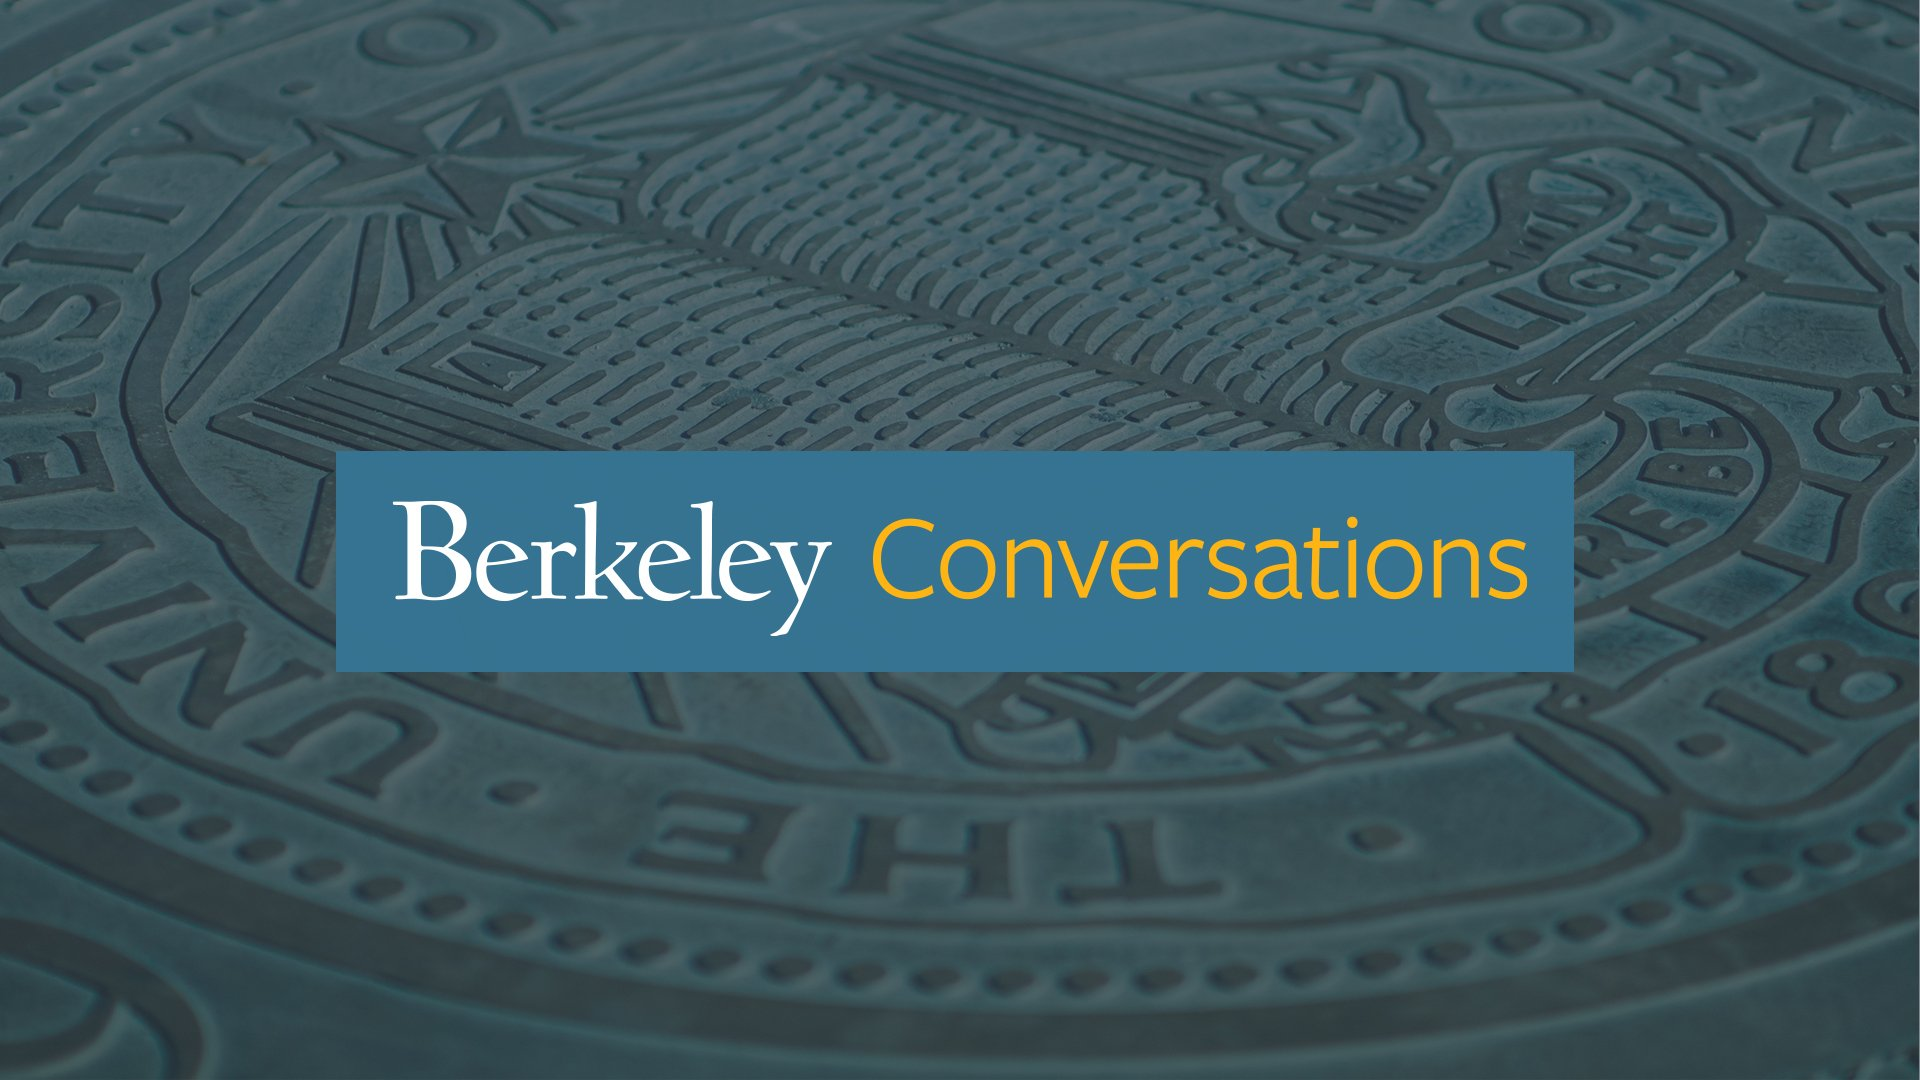 Berkeley-seal-blue-bar